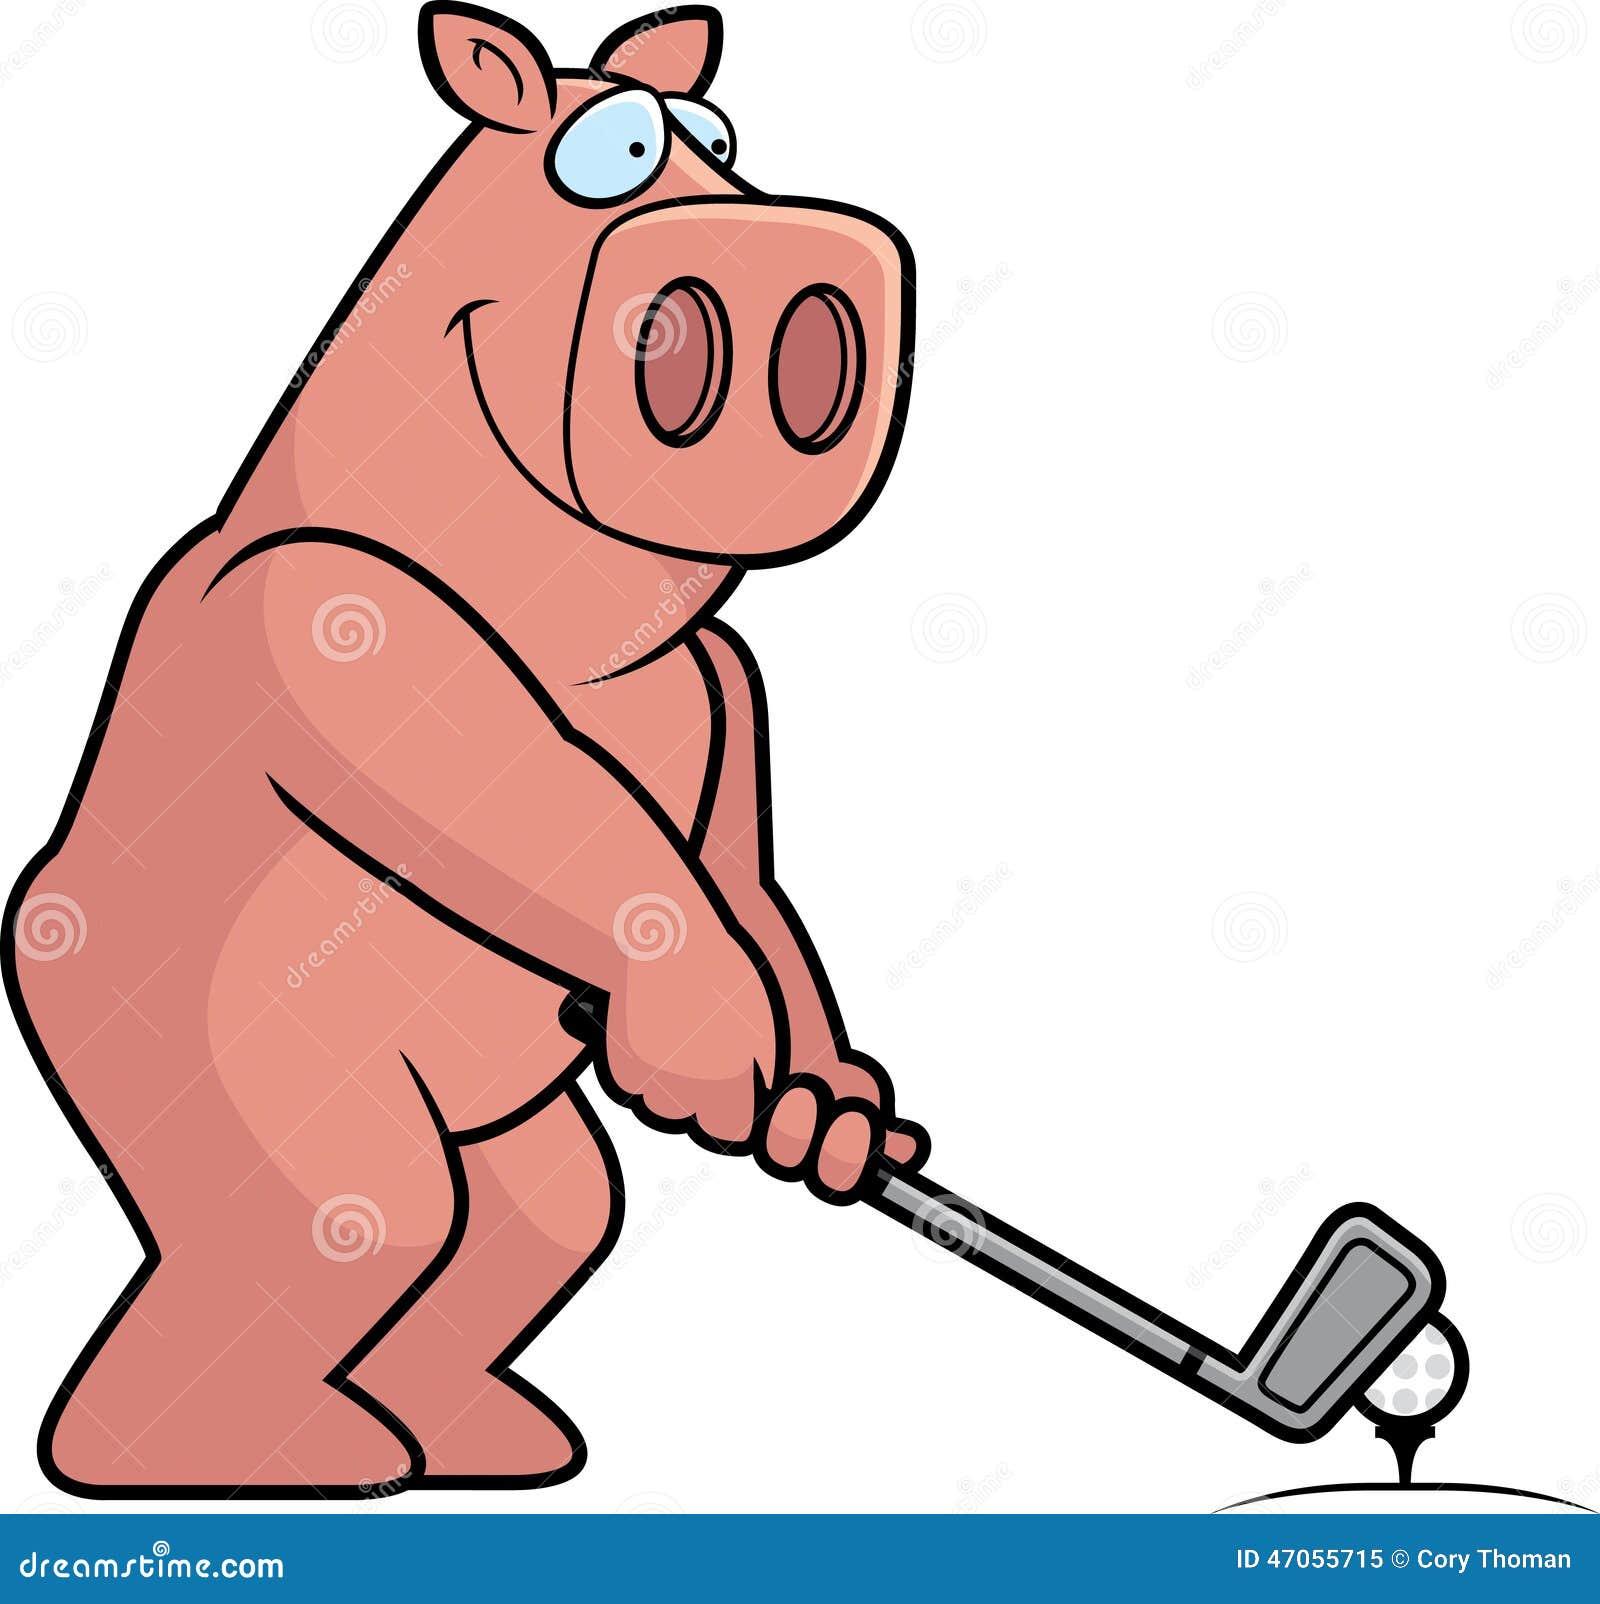 Cartoon Pig Golfing Stock Vector - Image: 47055715 Golf Ball On Tee Clipart